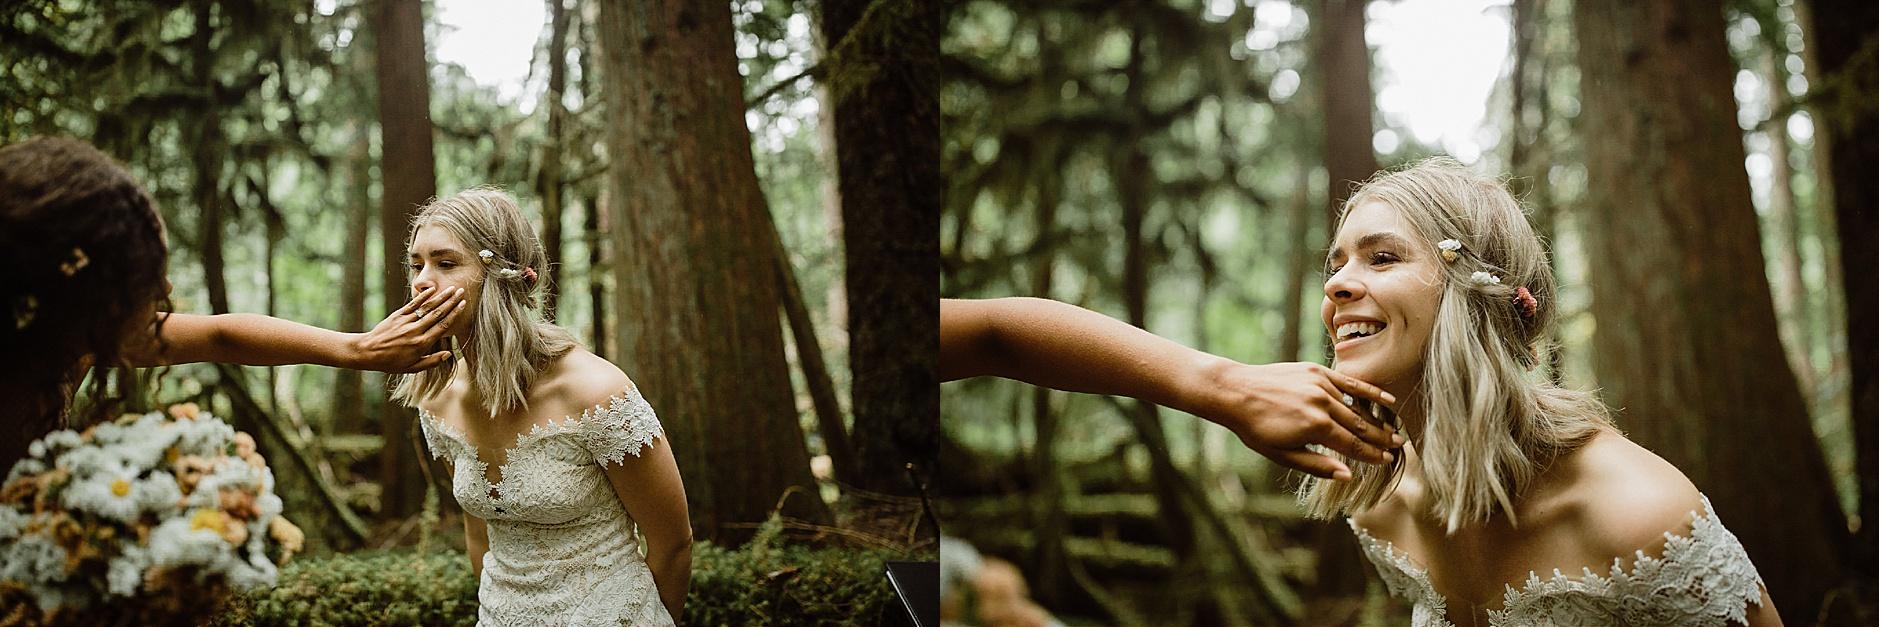 Summer Seattle Mt. Rainier Elopement Ideas (90 of 139).jpg